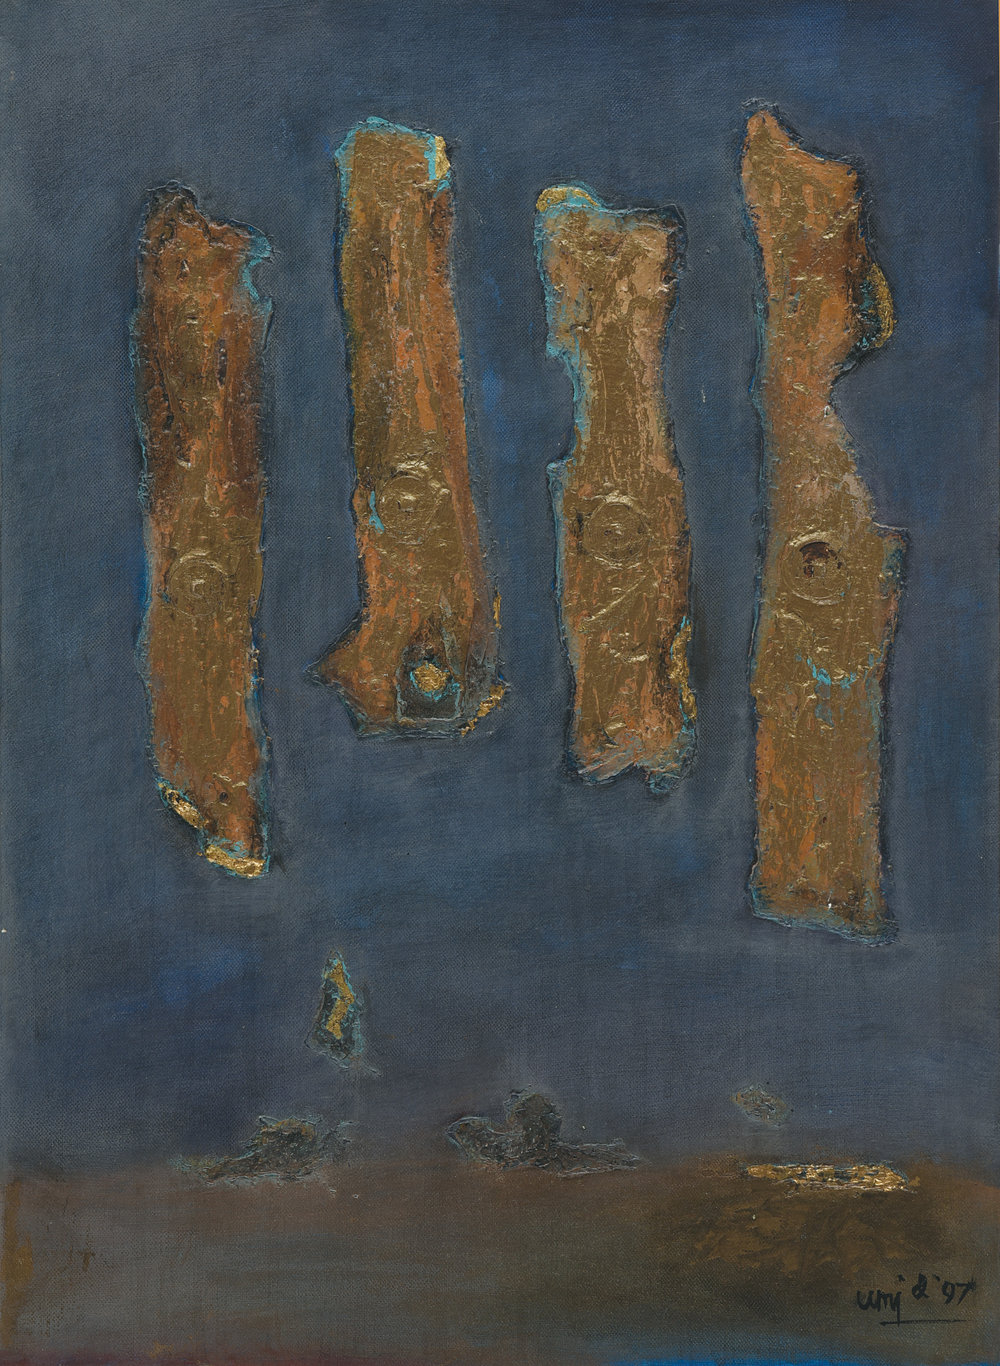 Umi Dachlan, Pilar Emas diatas Biru (Golden Pillars on Blue), ooc, 58 x 42 cm, 1997.jpg